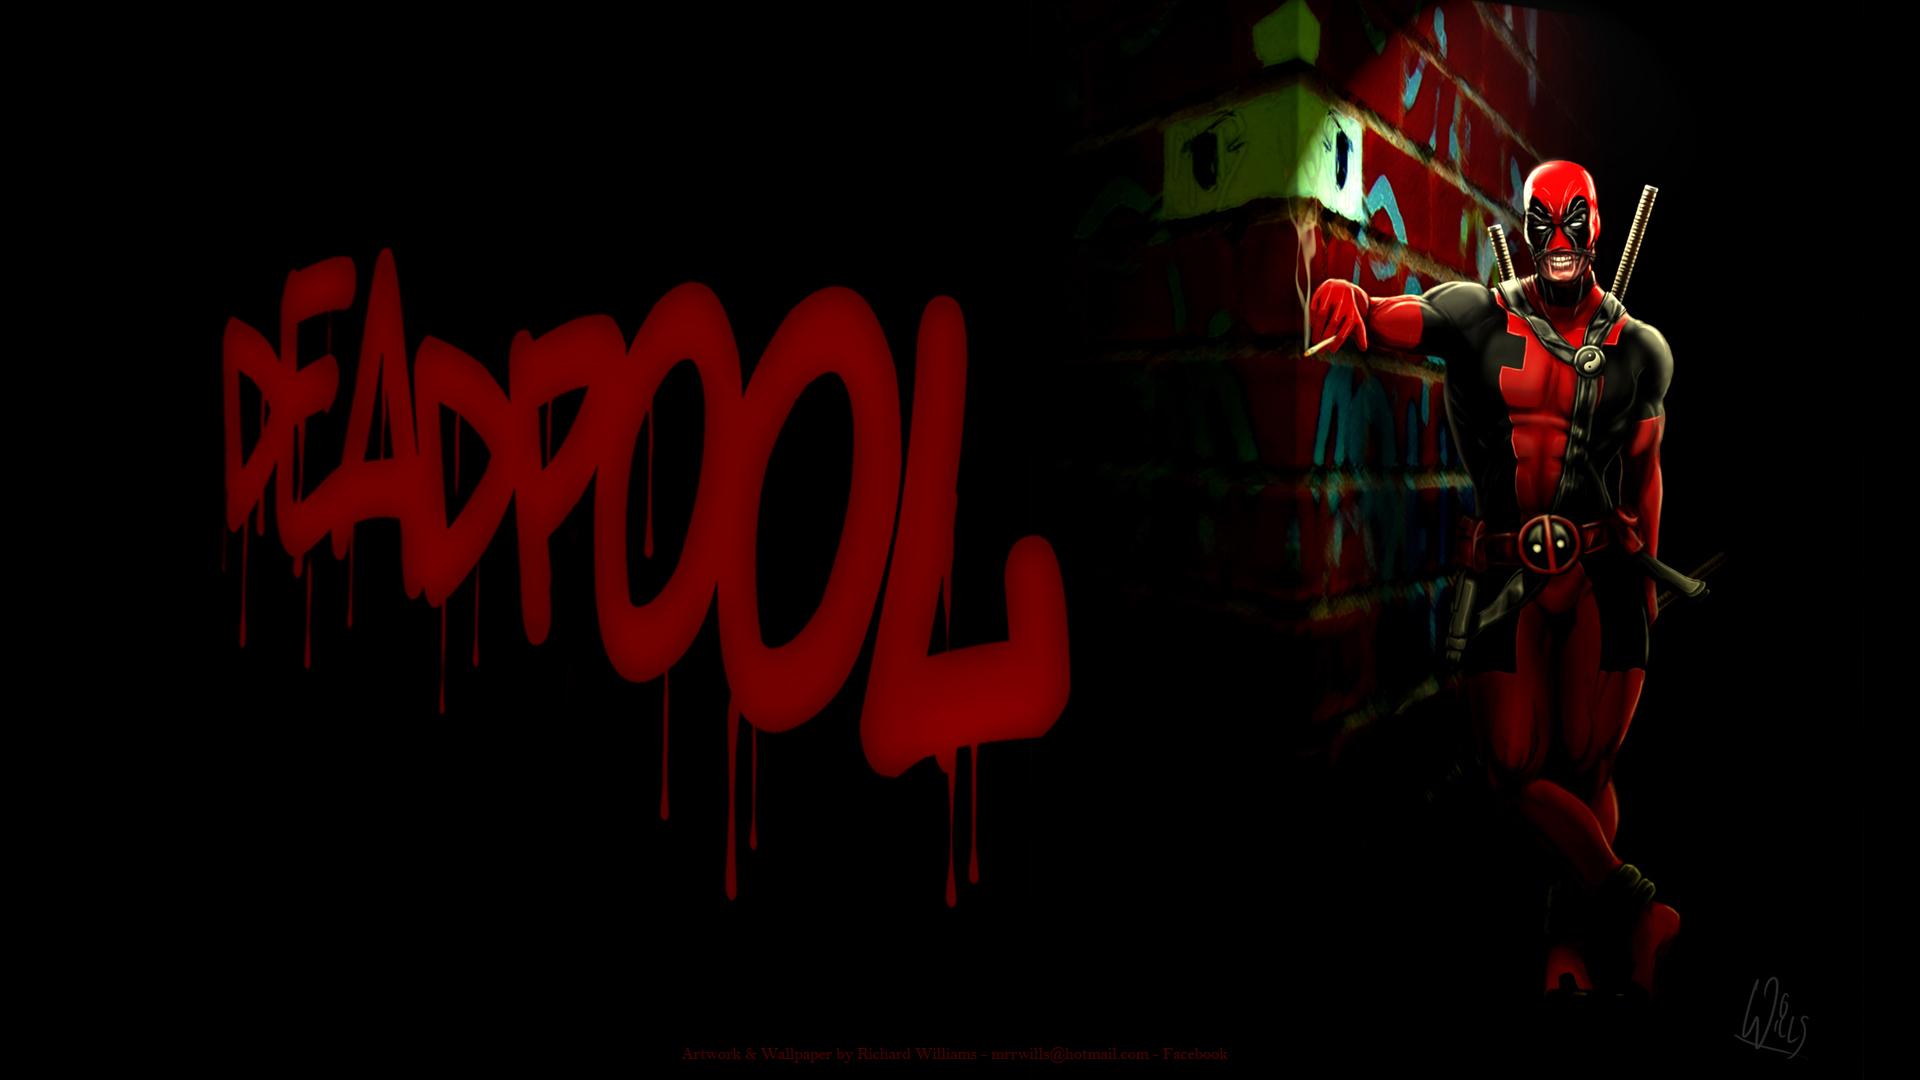 Deadpool Wallpaper Hd 152869 1920x1080